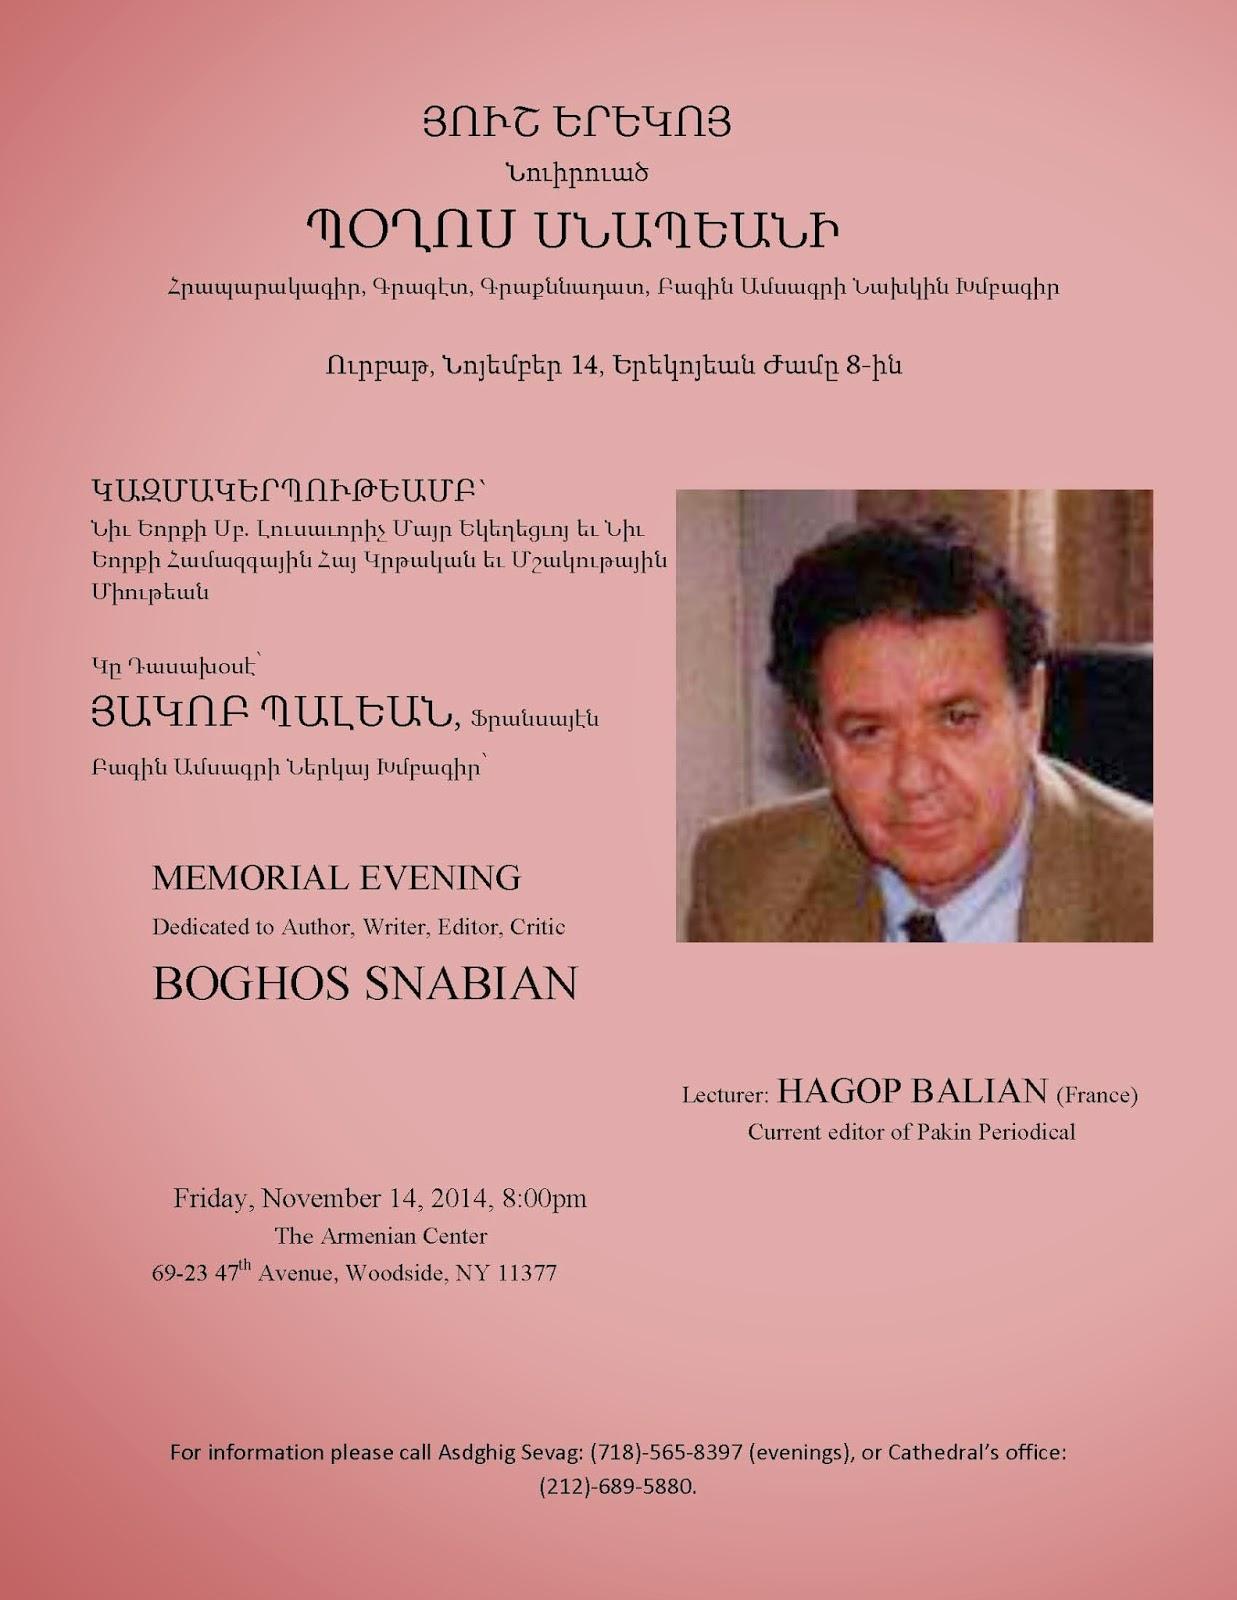 Memorial Program | Armenian Poetry Project Memorial Program Dedicated To Boghos